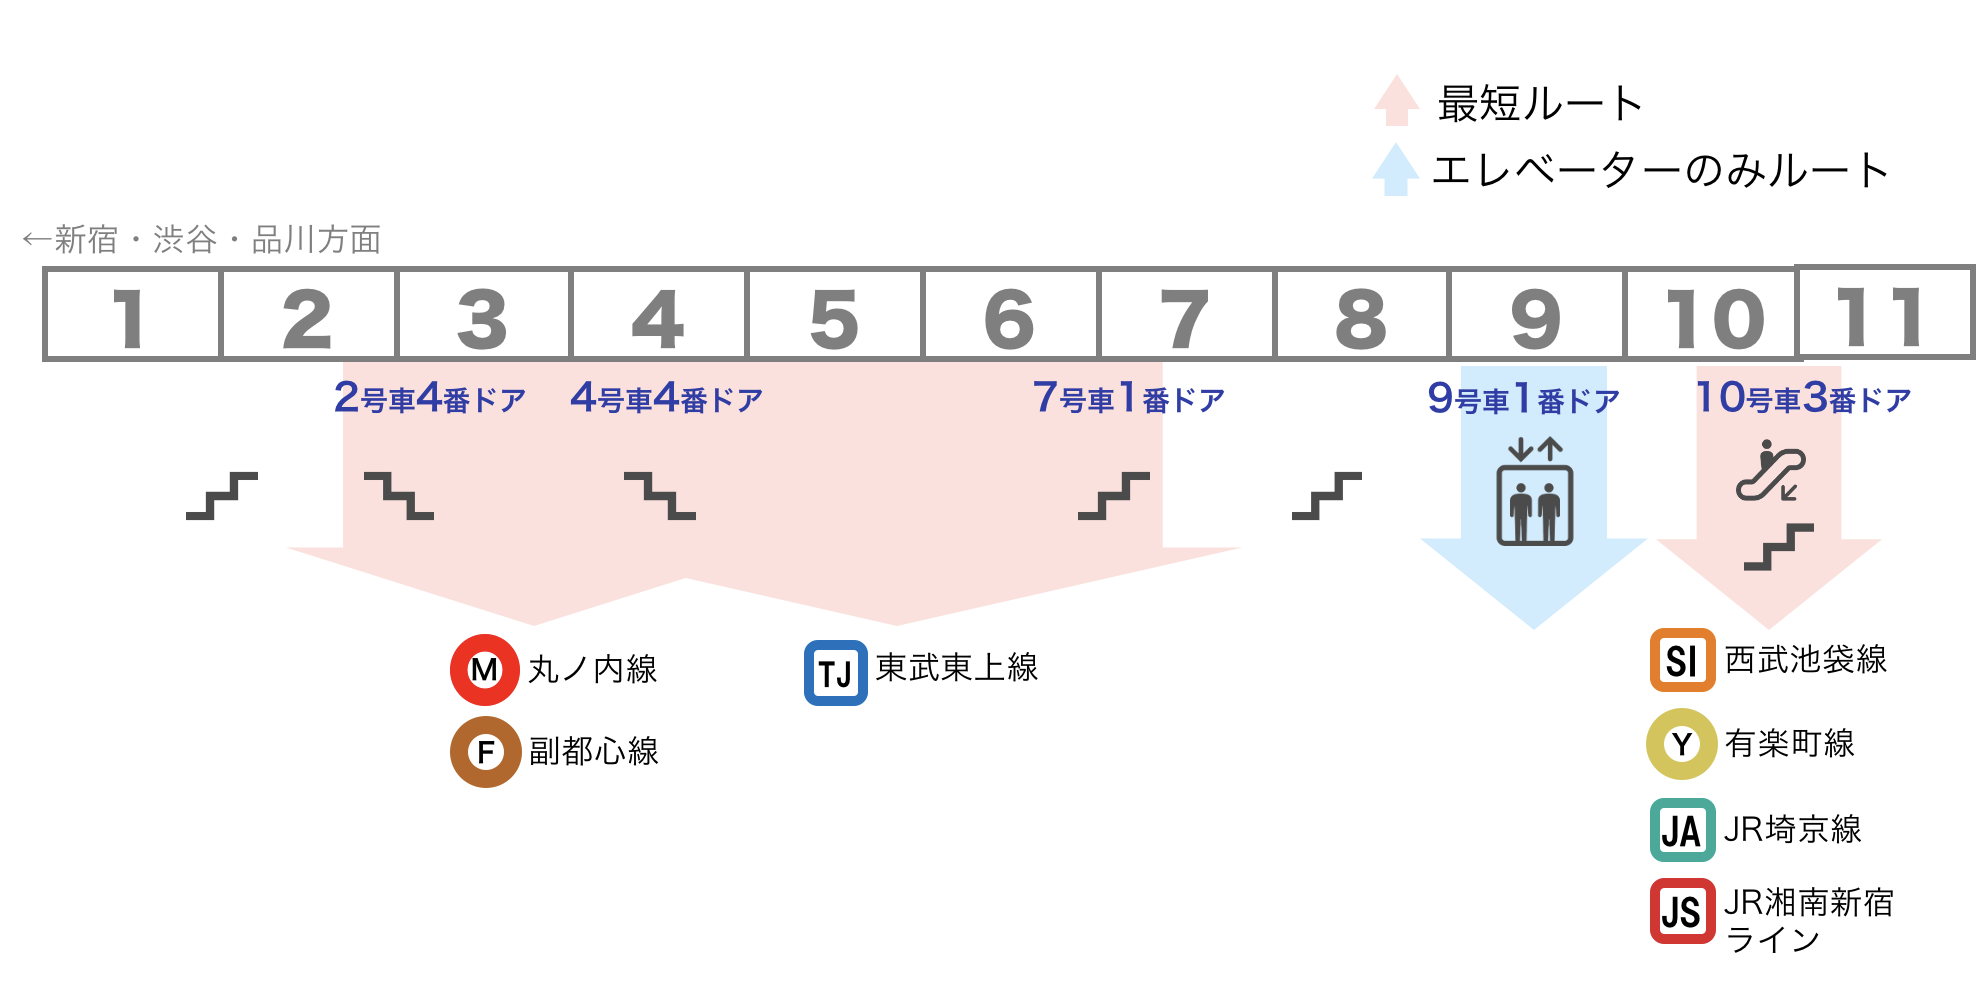 池袋駅 JR山手線 5・6番線(新宿方面ゆき)ホーム 乗車位置案内